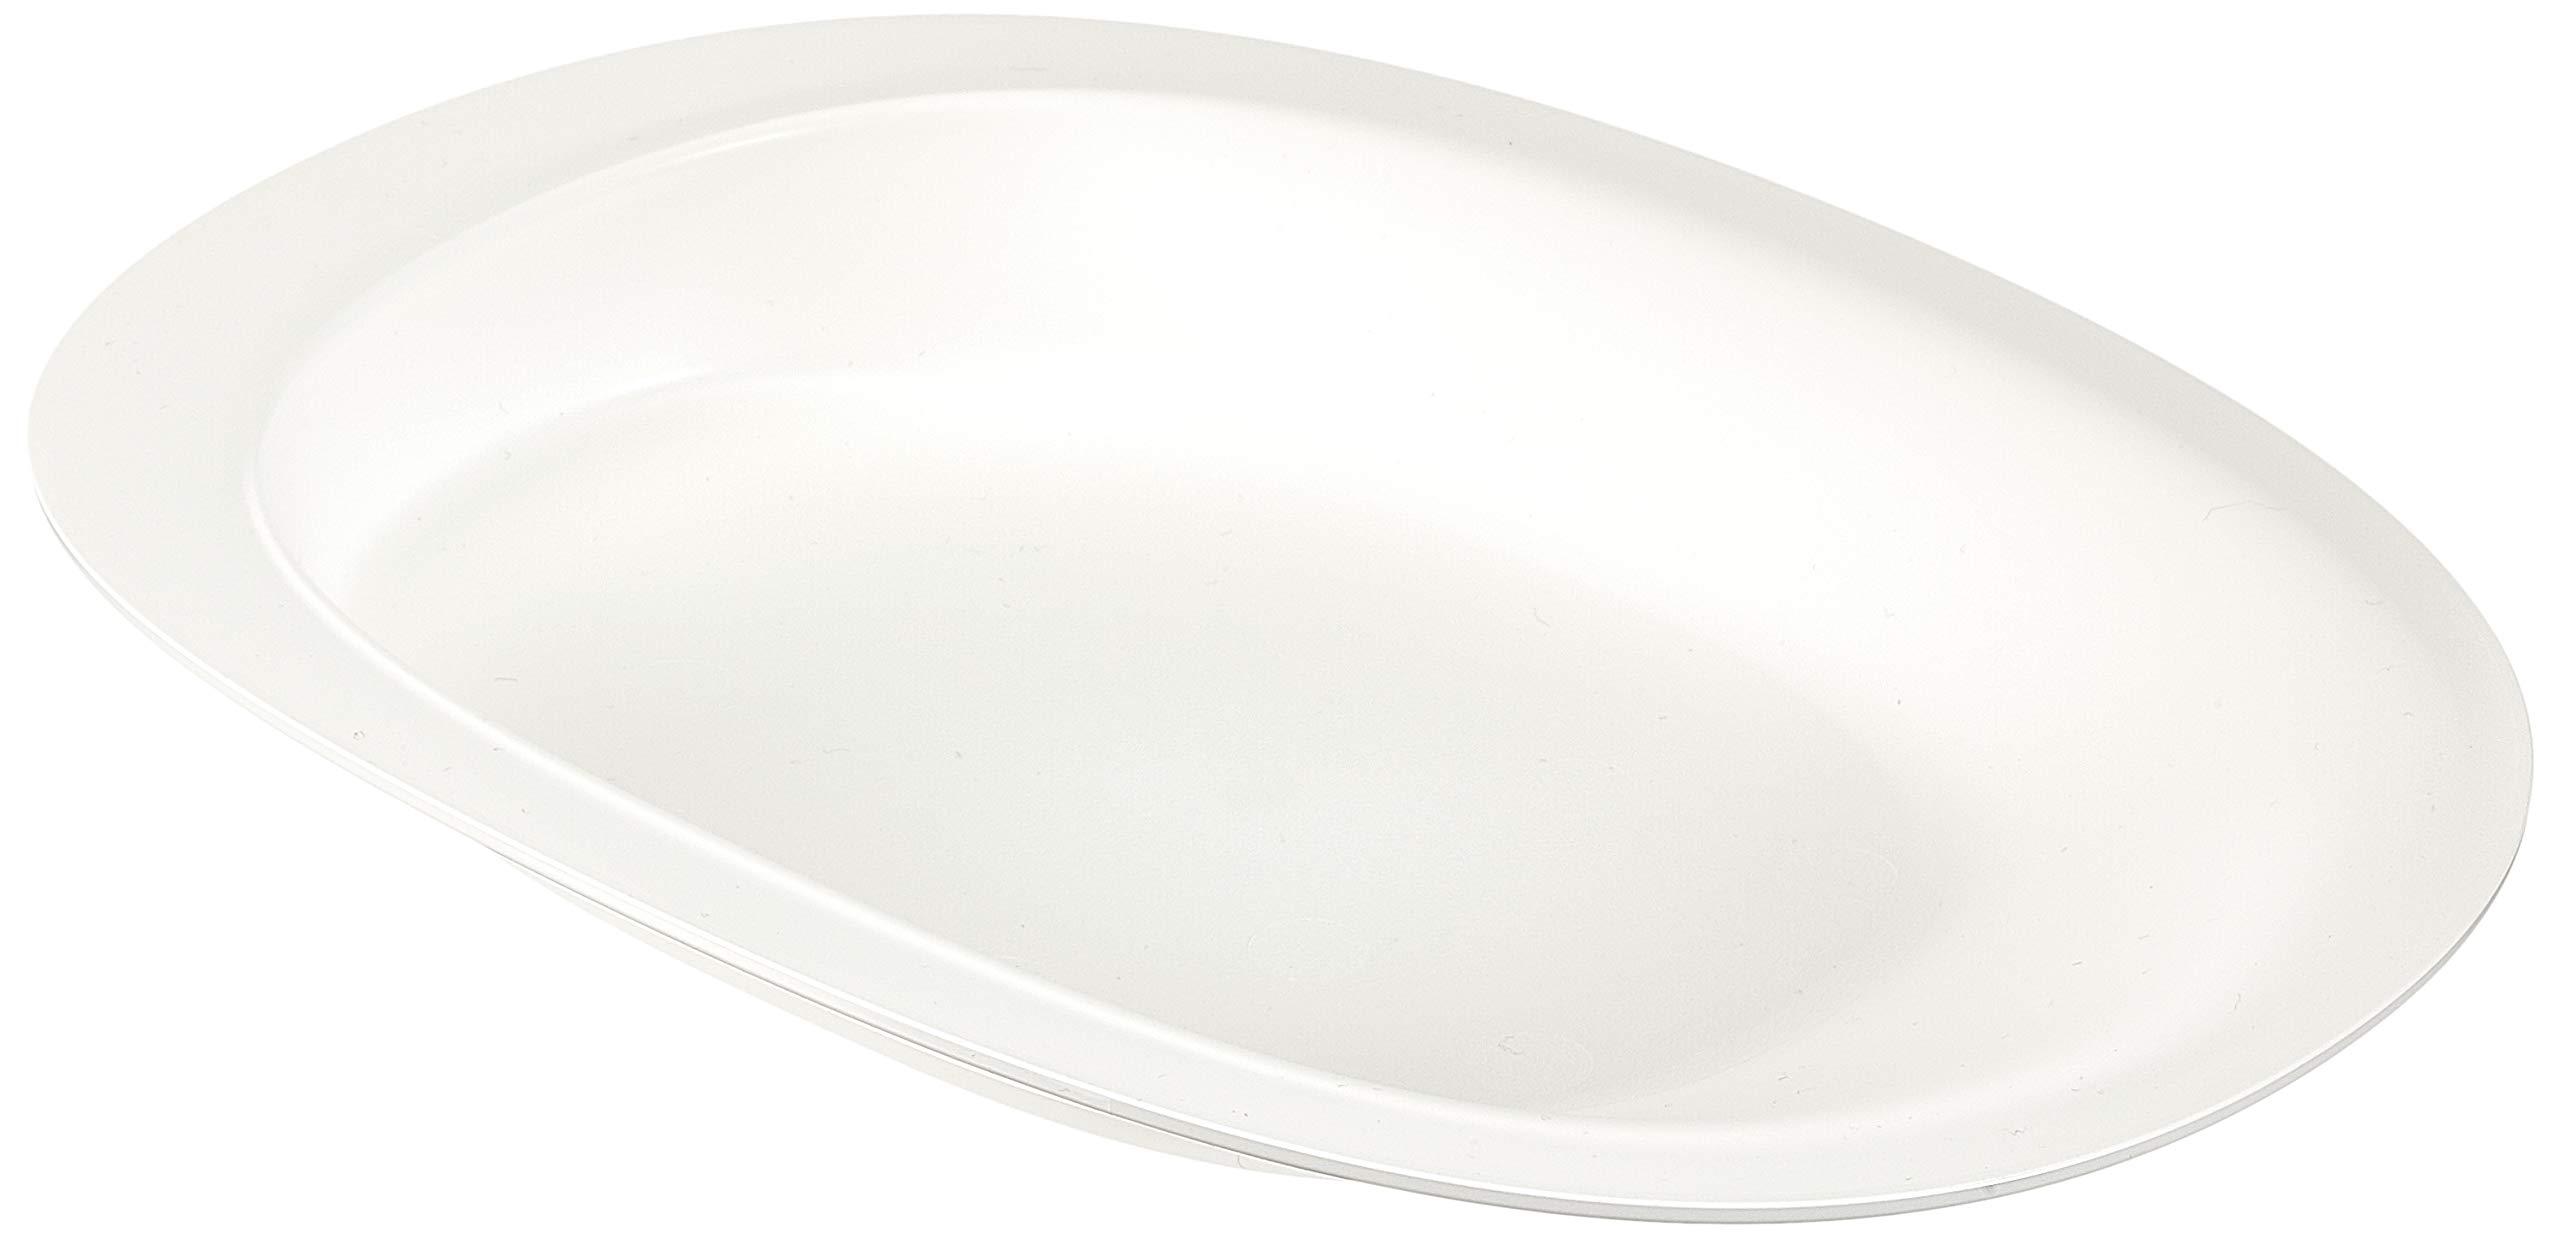 Able2 Henro PR65553 Plate 28 x 20 cm White